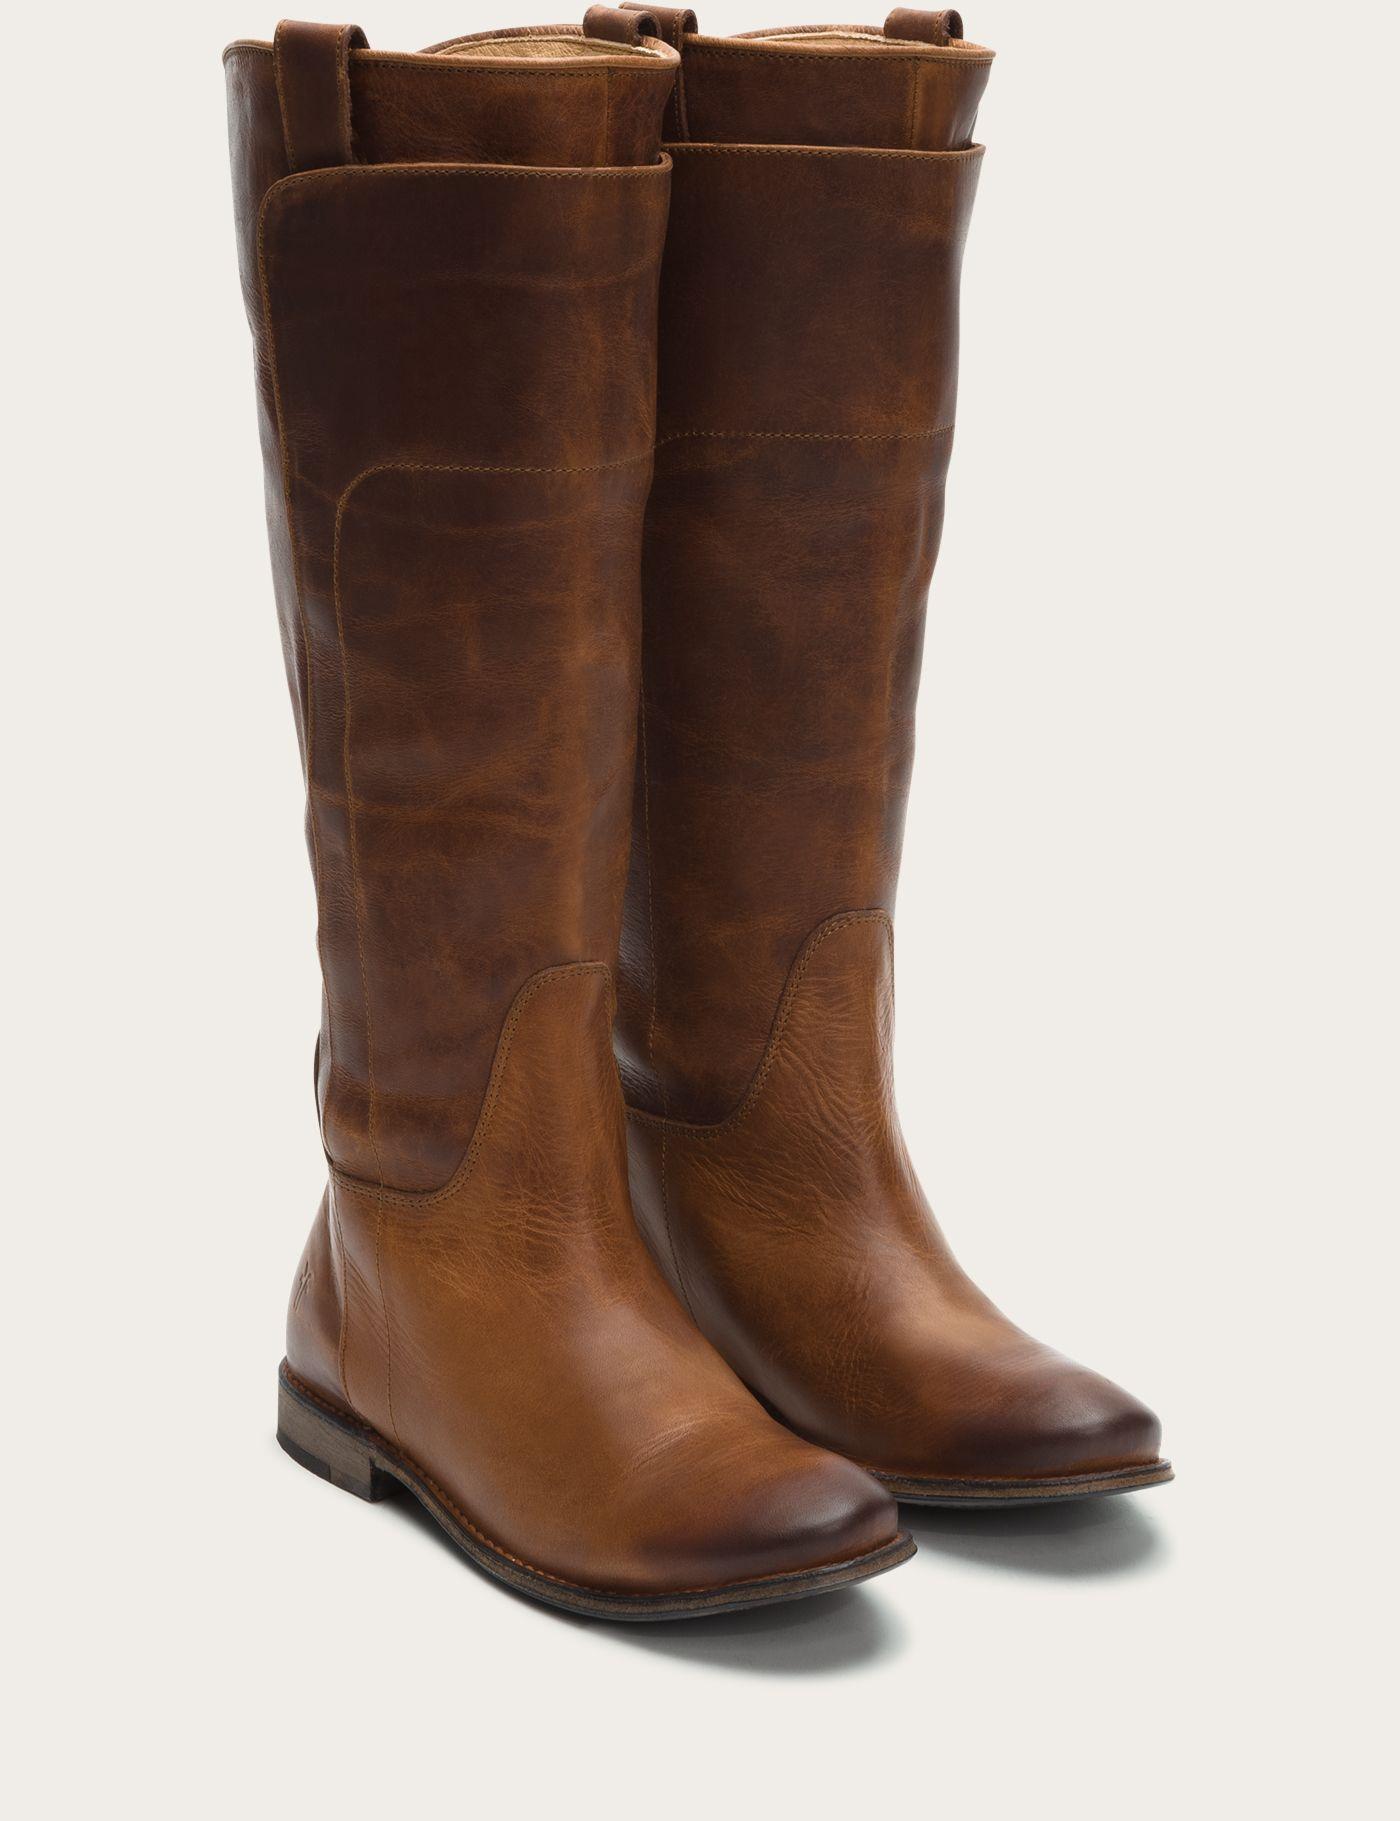 Paige Tall Riding Block Heel Boots obuxj4Gv